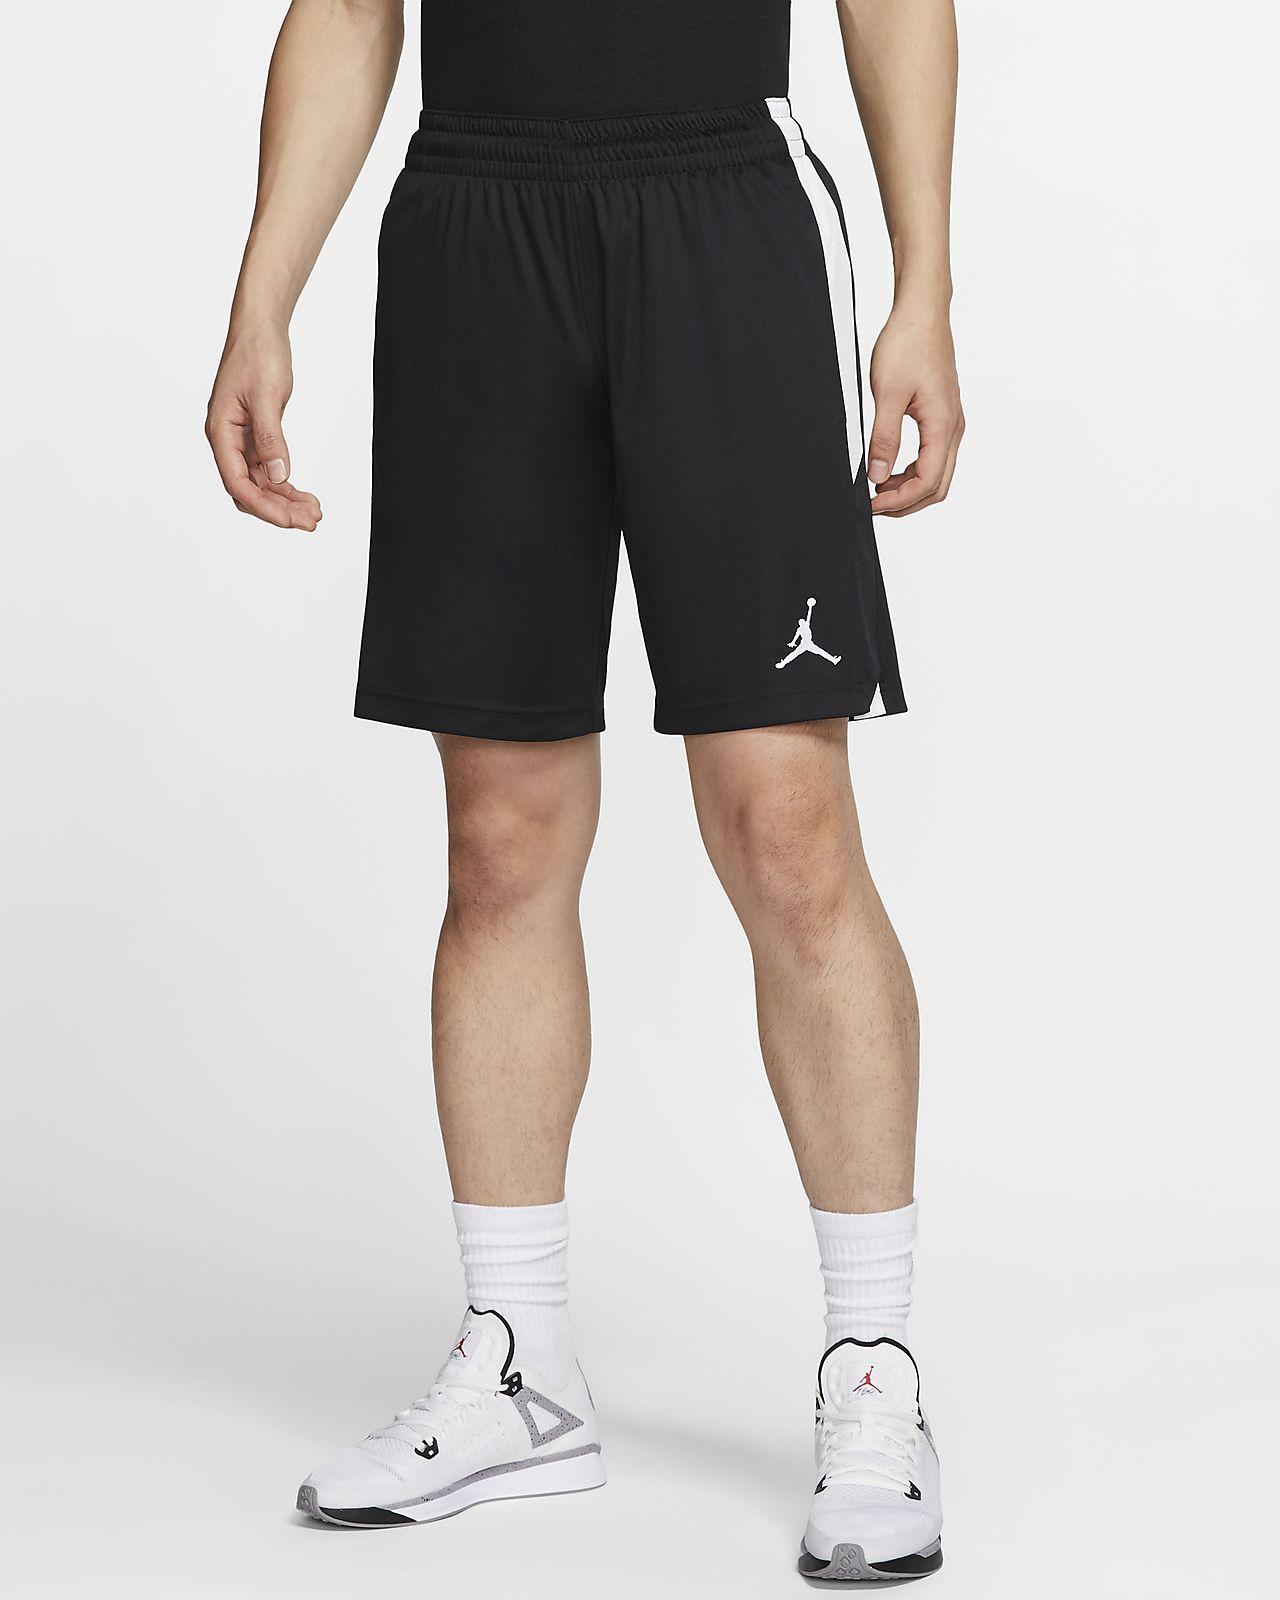 Shorts de entrenamiento para hombre Jordan Dri-FIT 23 Alpha